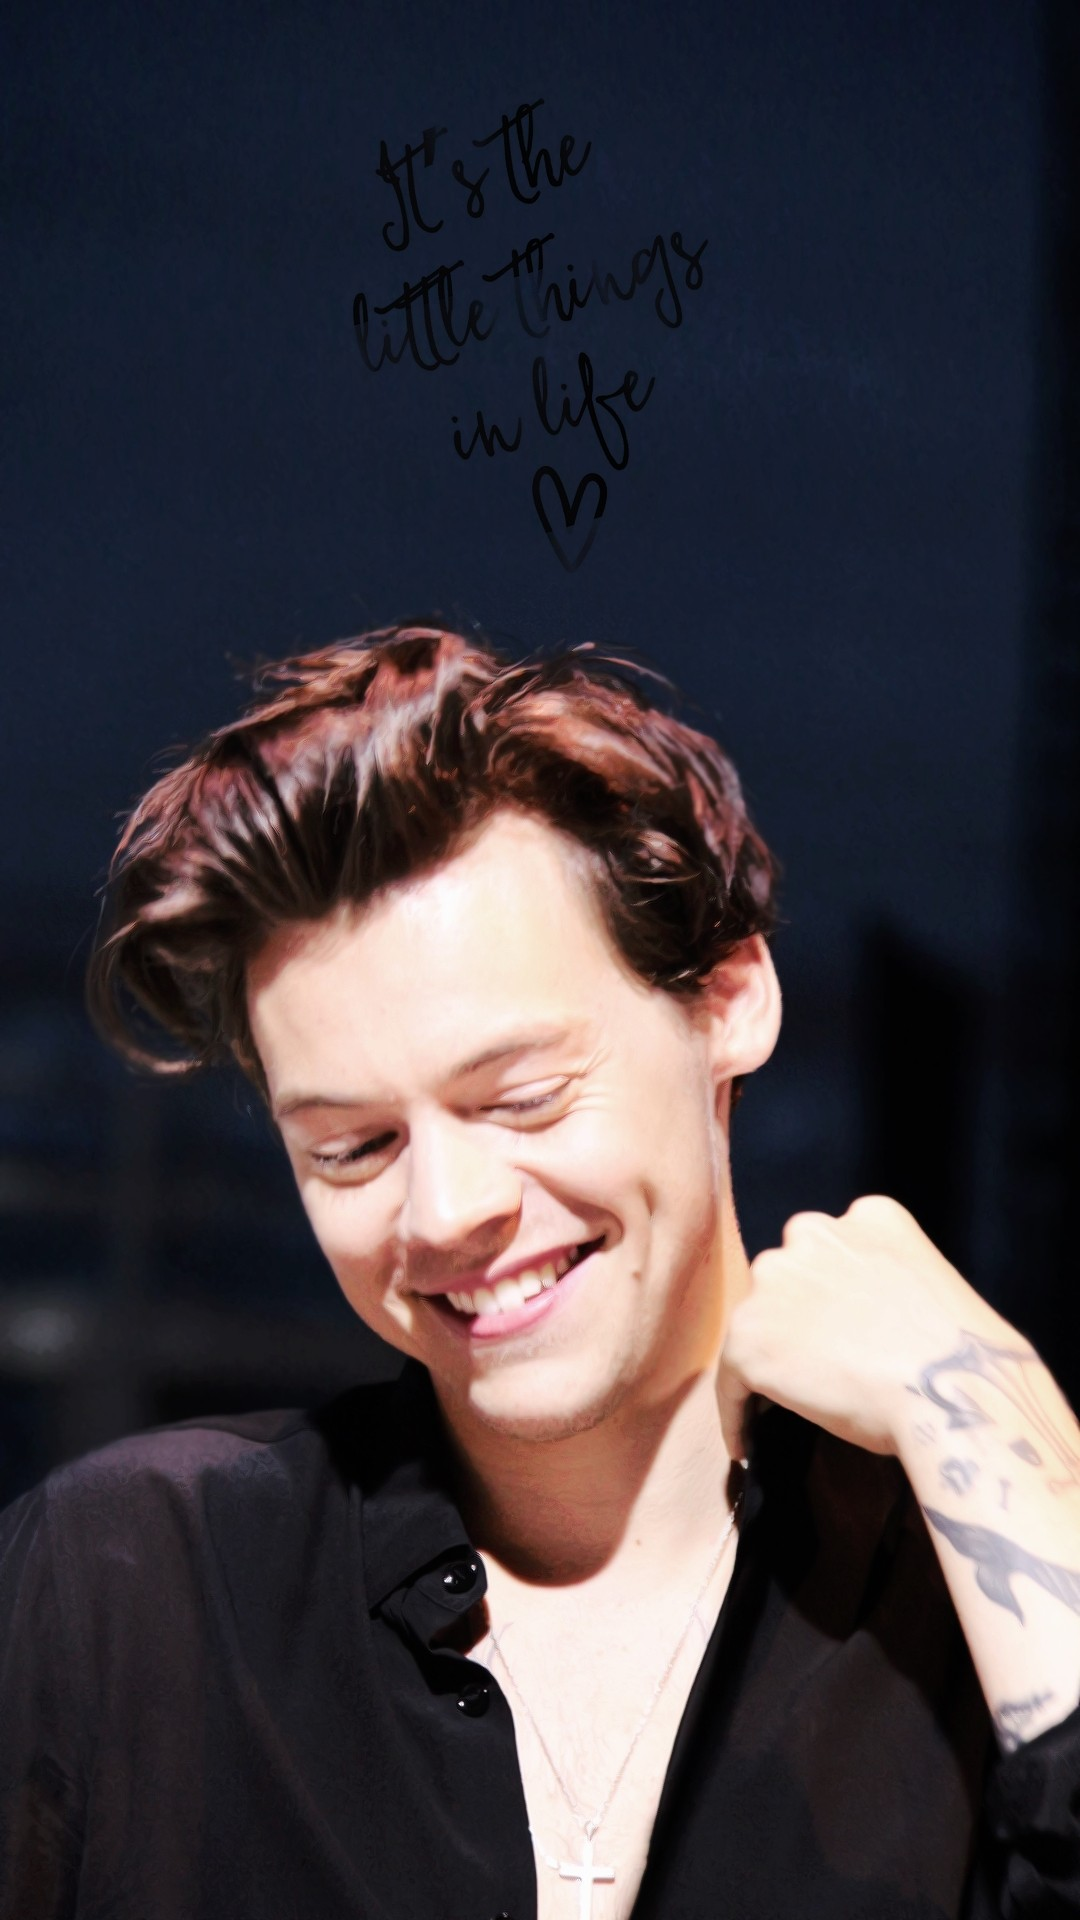 Harry Styles iPhone wallpaper